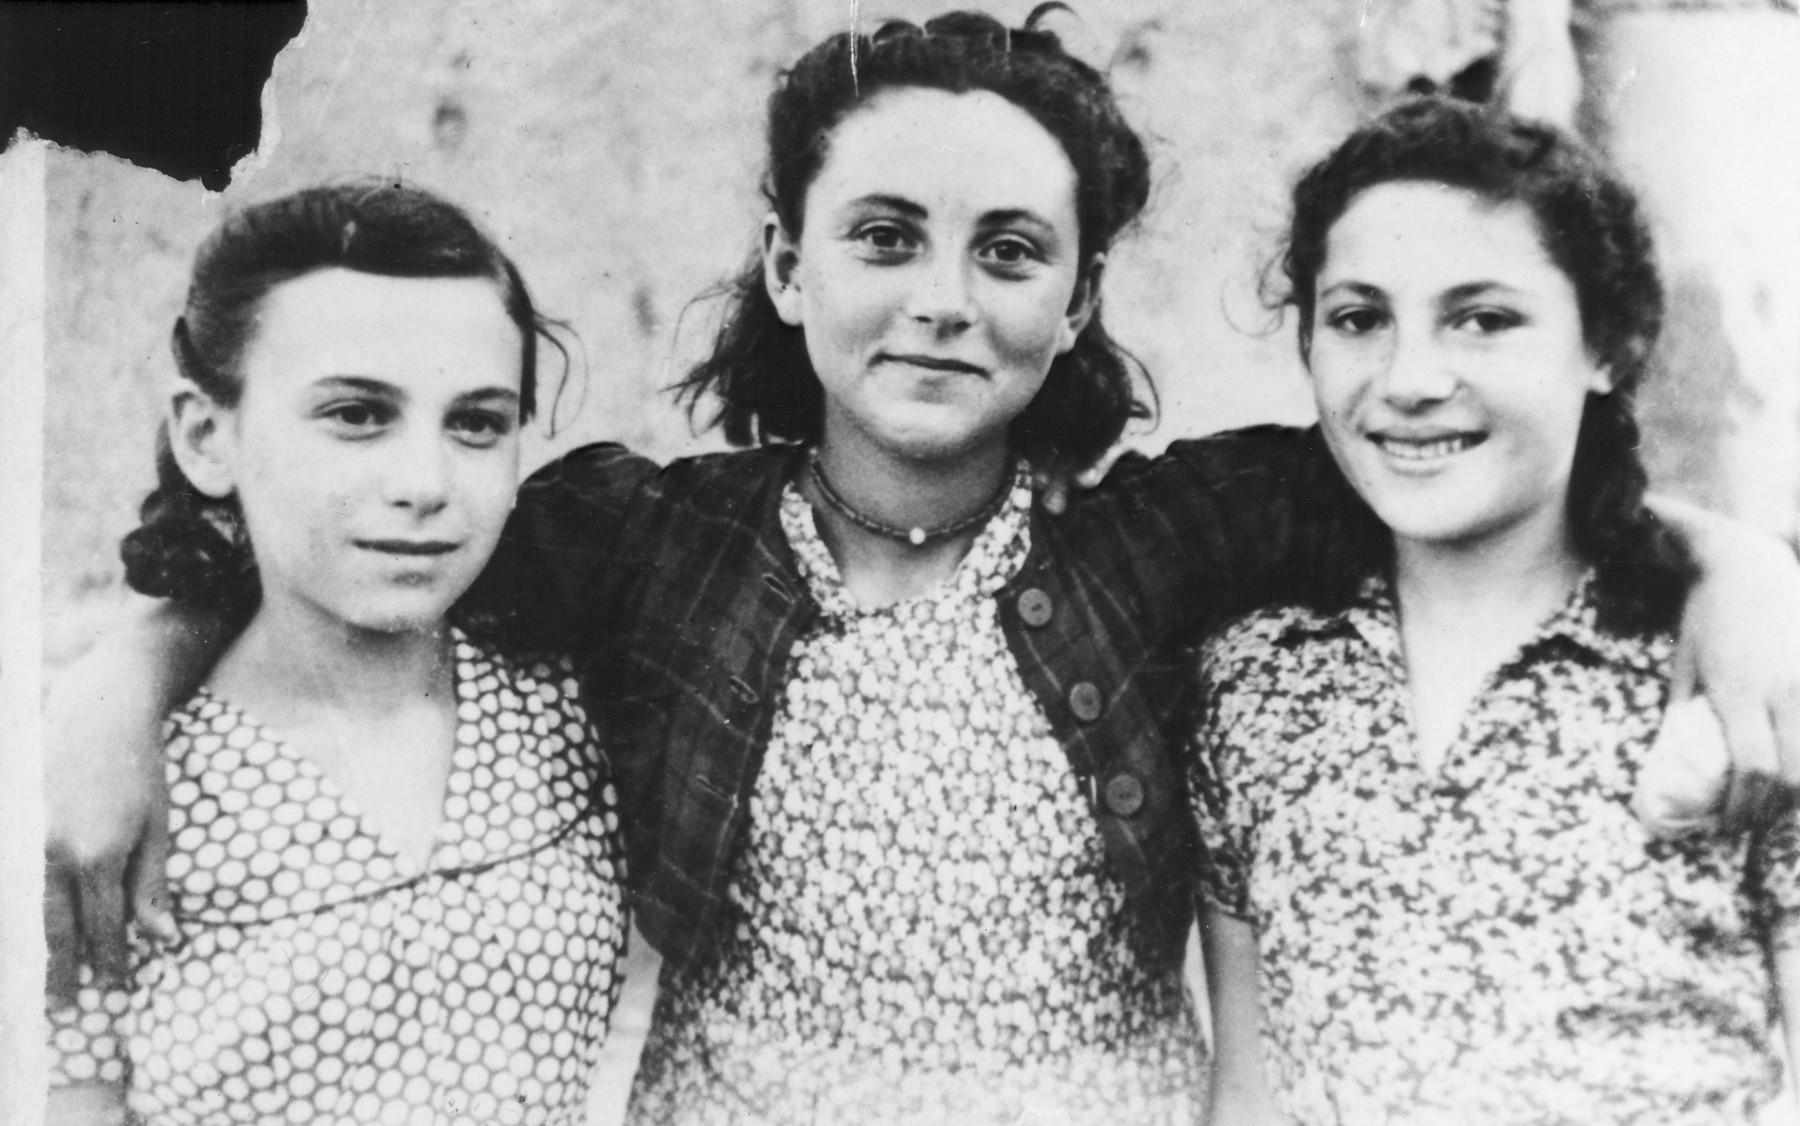 Portrait of three Jewish refugees in Uzbekistan.  Mira Stillman is pictured on the far left.